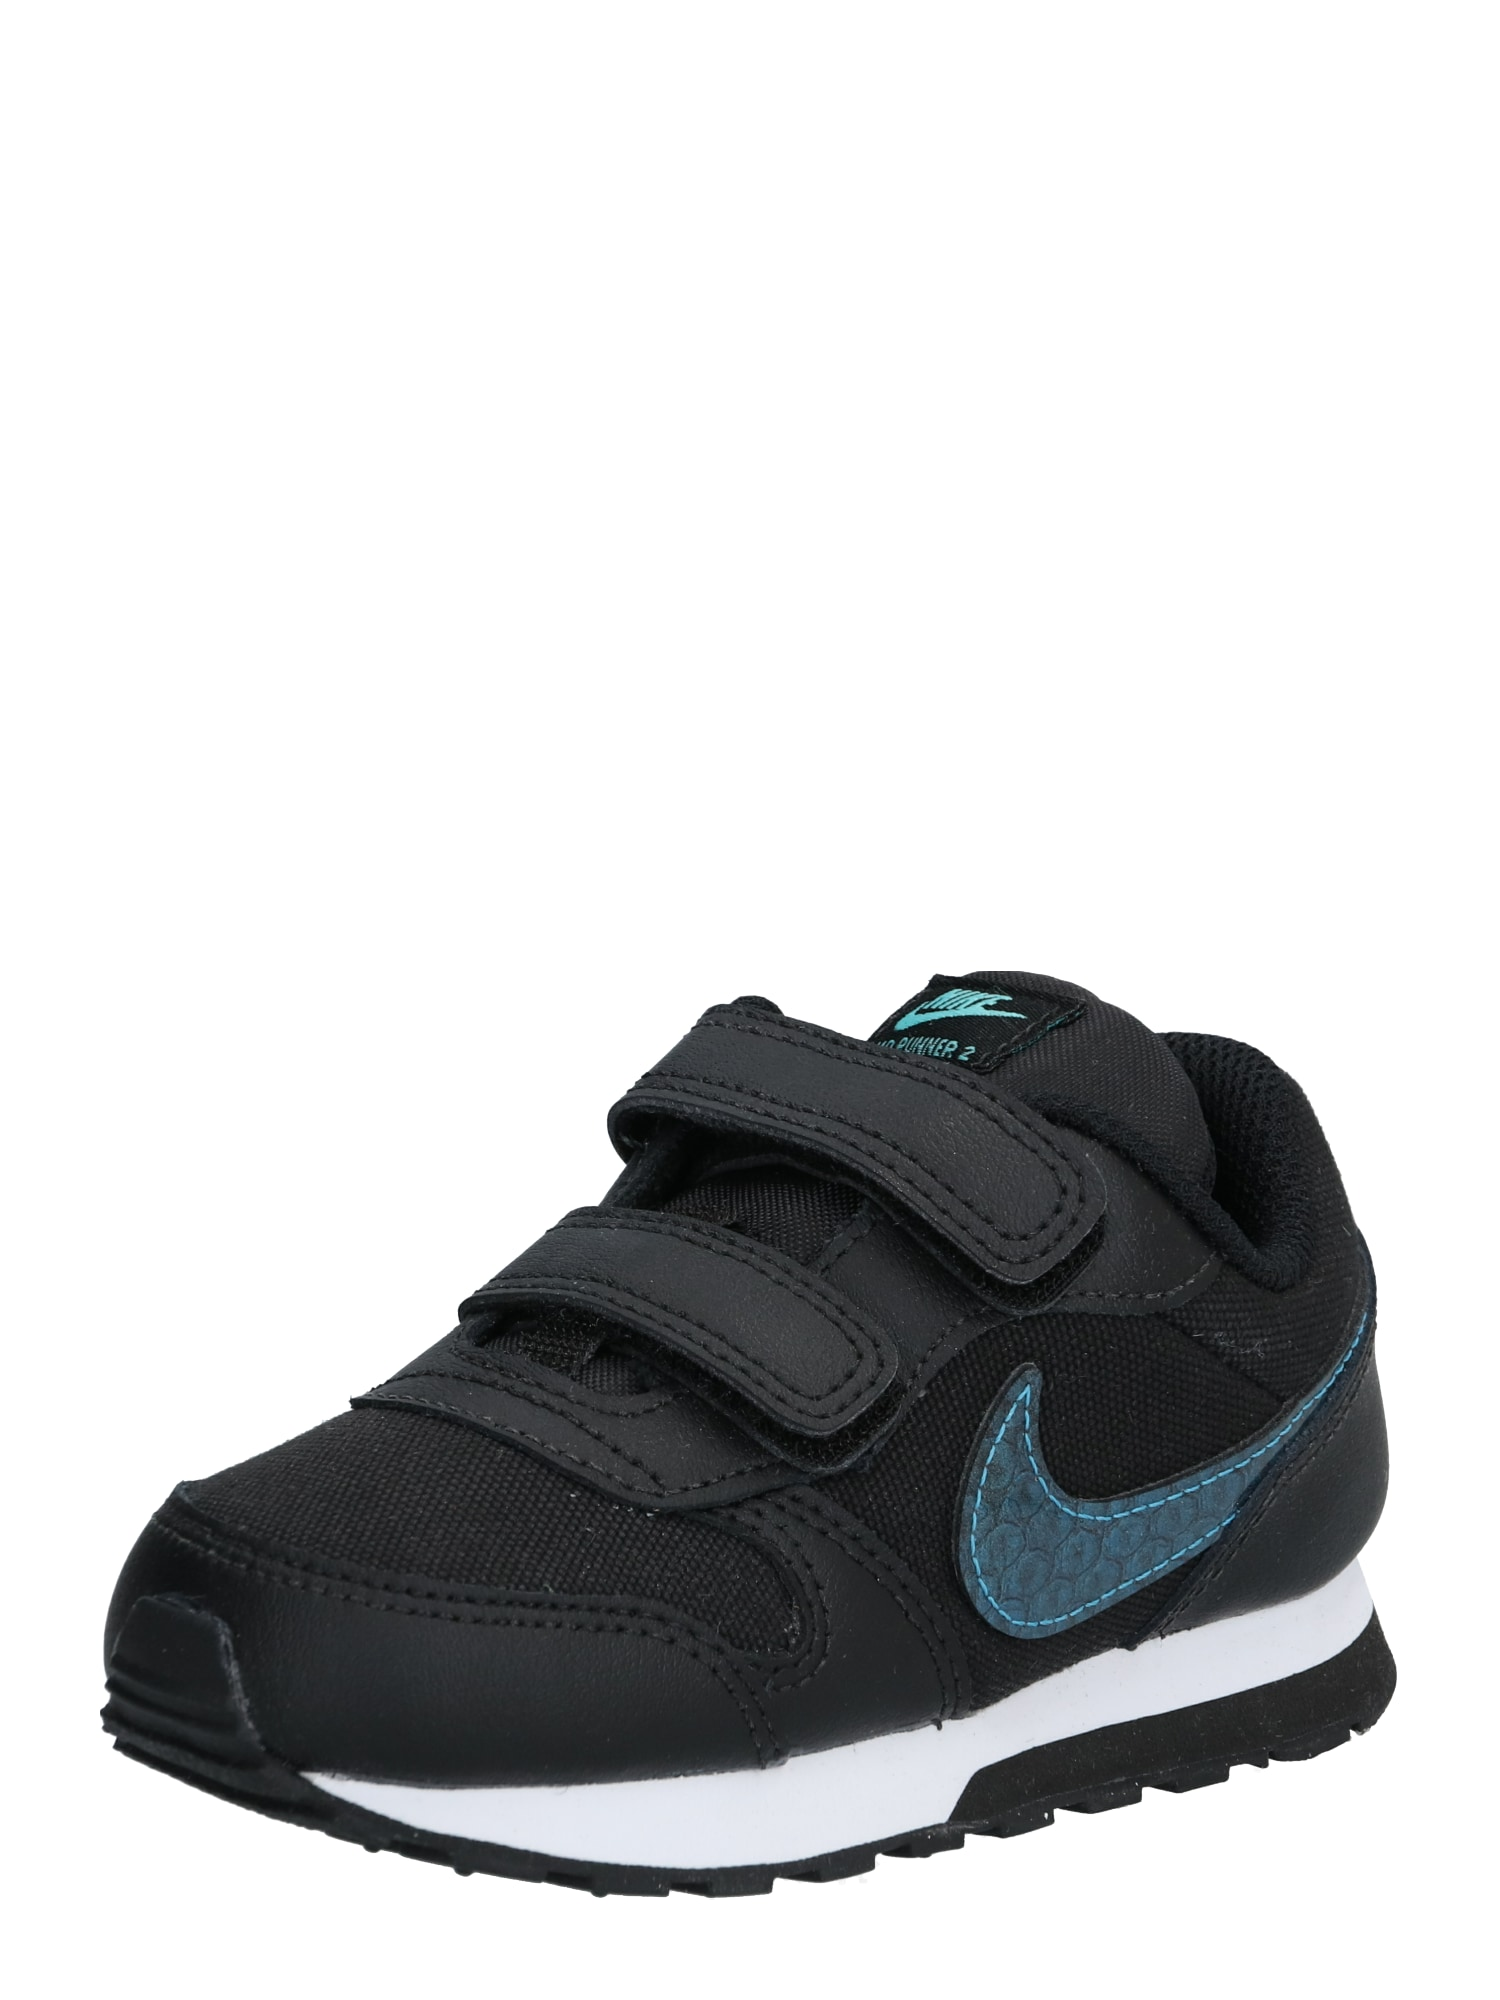 Nike Sportswear Sportbačiai 'Runner 2 Dragon' antracito / juoda / mėlyna